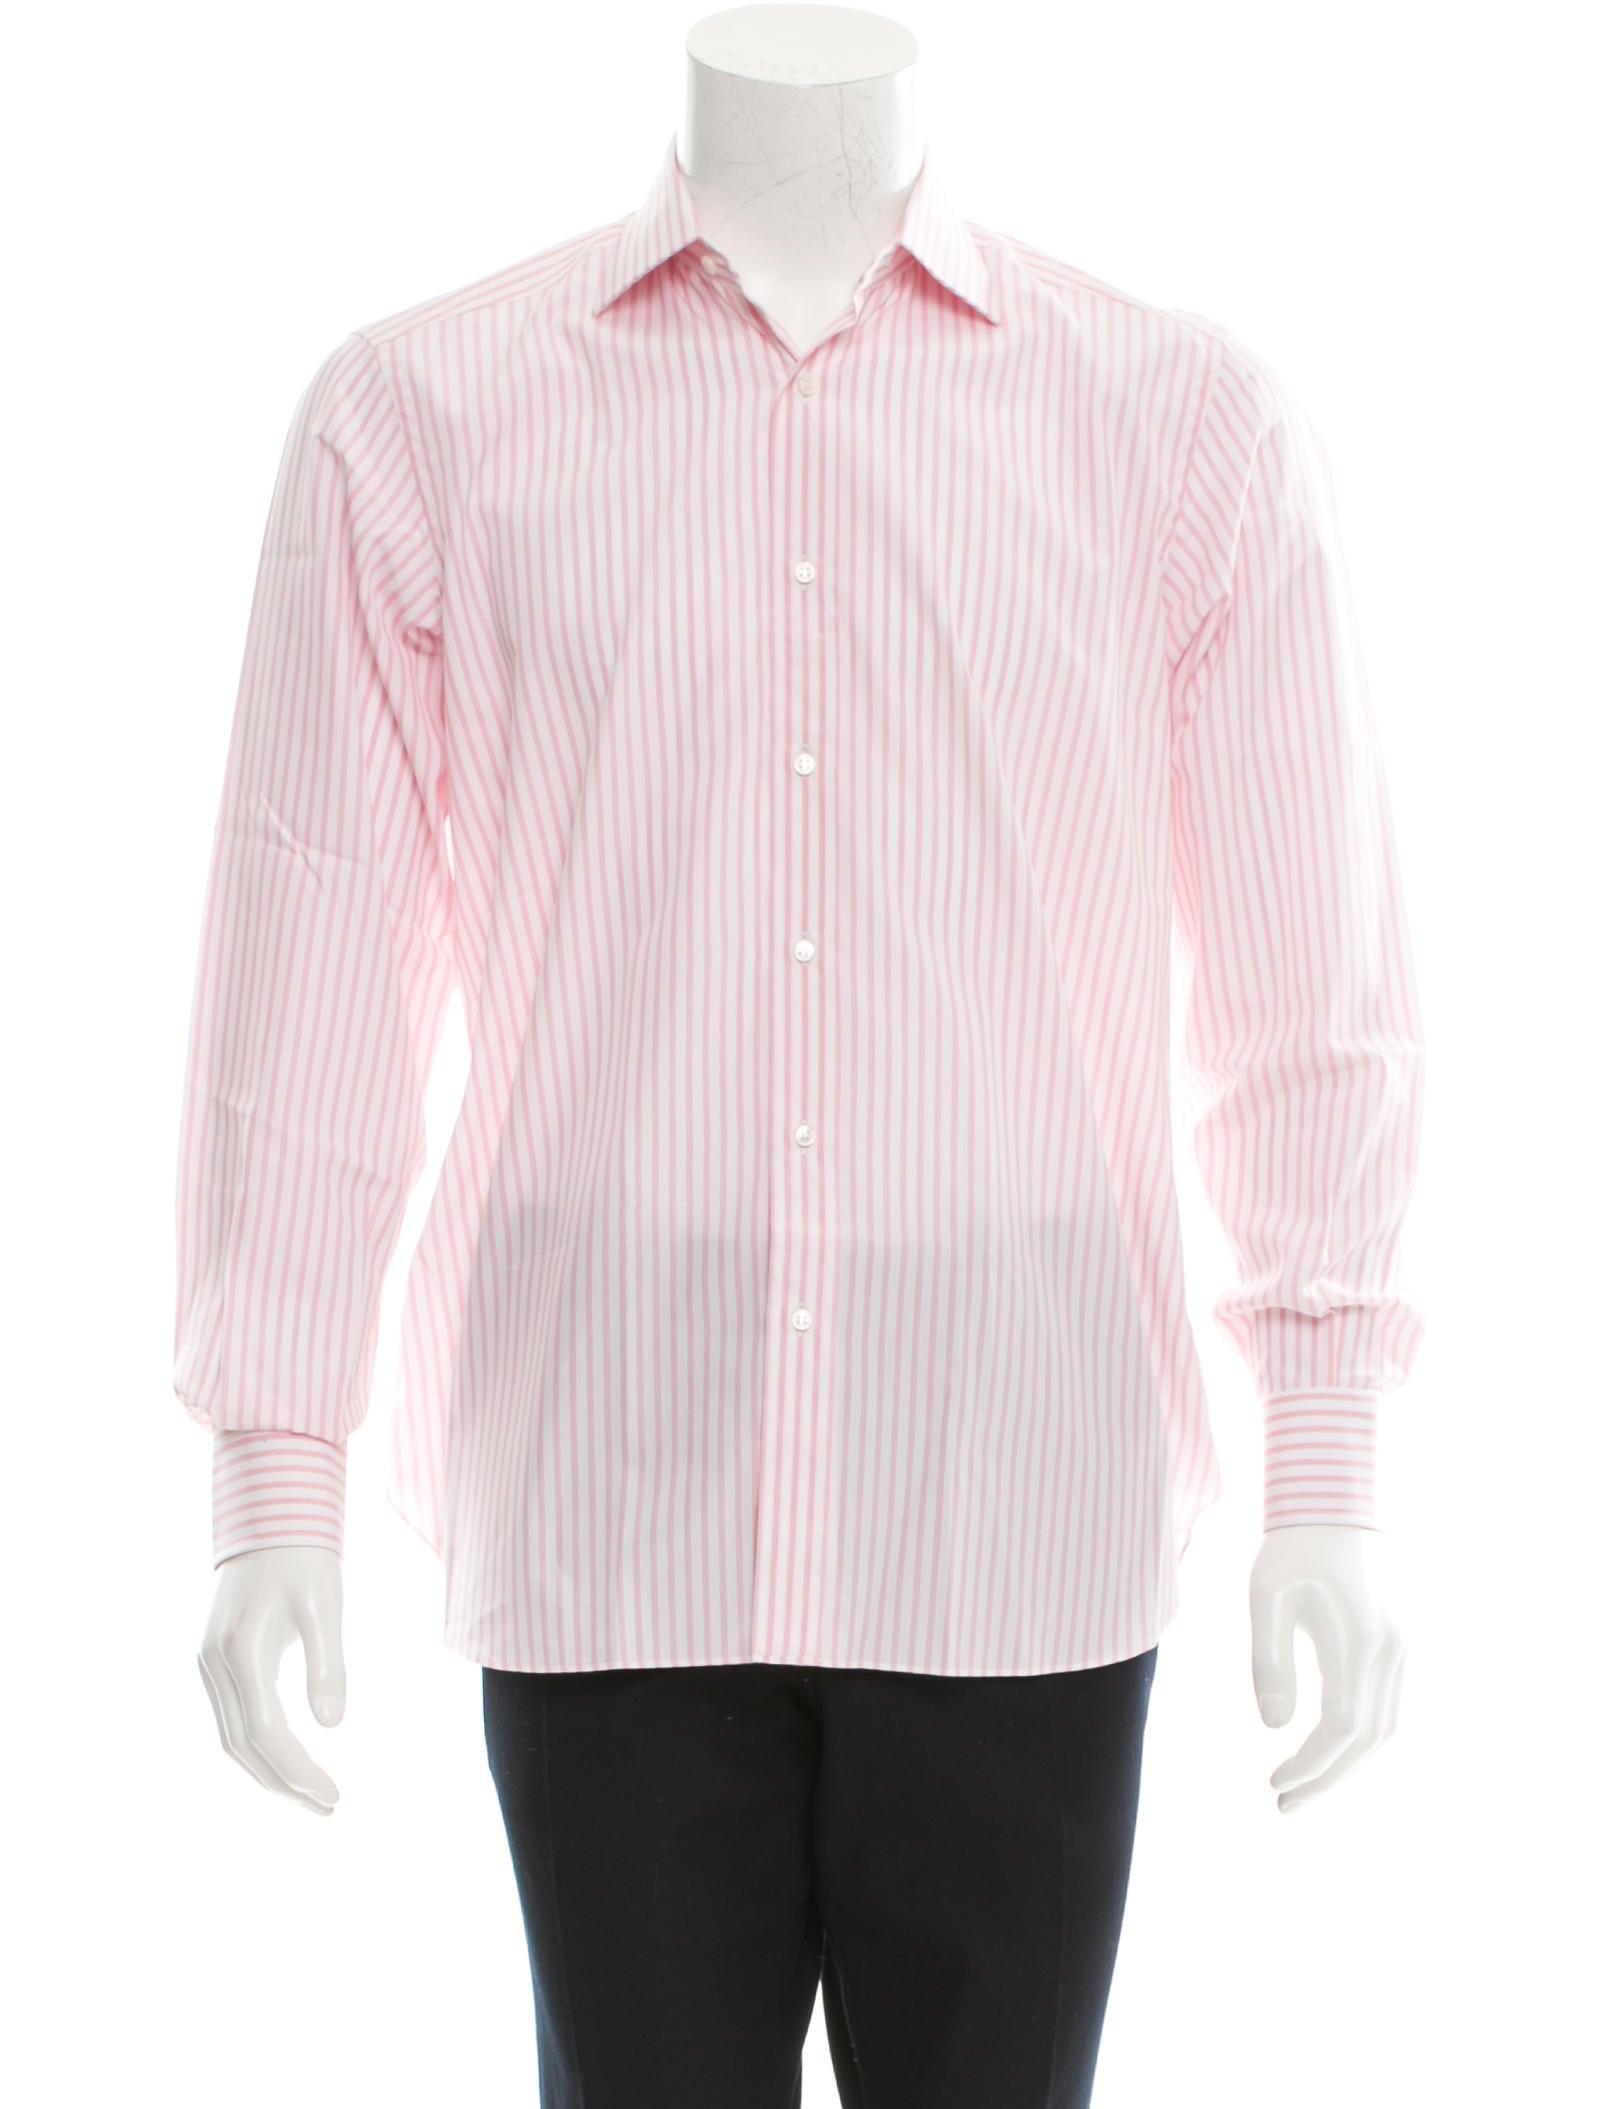 Brioni striped button up shirt clothing bro21187 the for Striped button up shirt mens